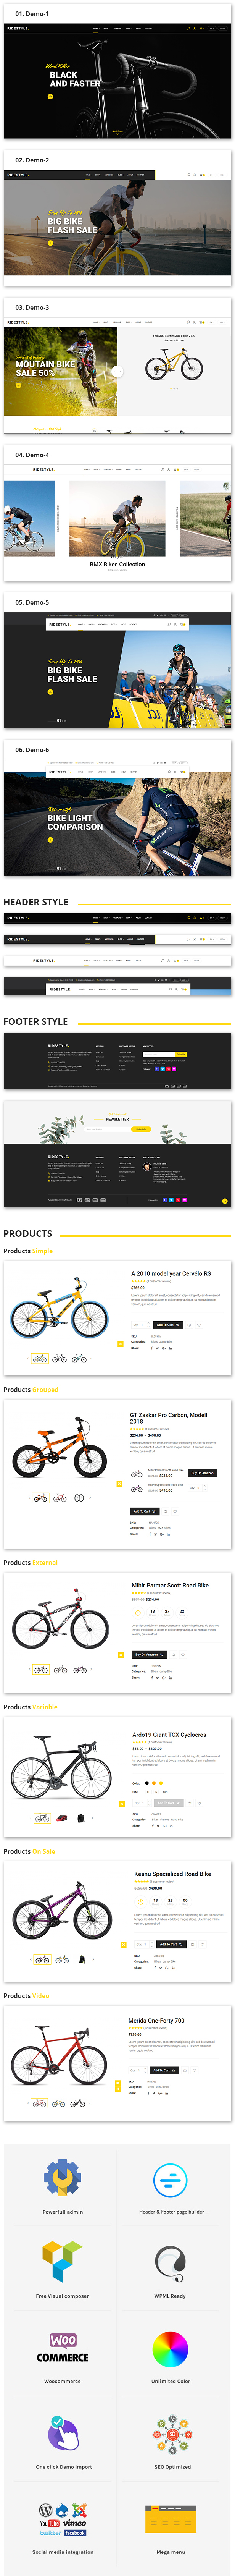 Ridestyle - Sport WooCommerce Layout - 3